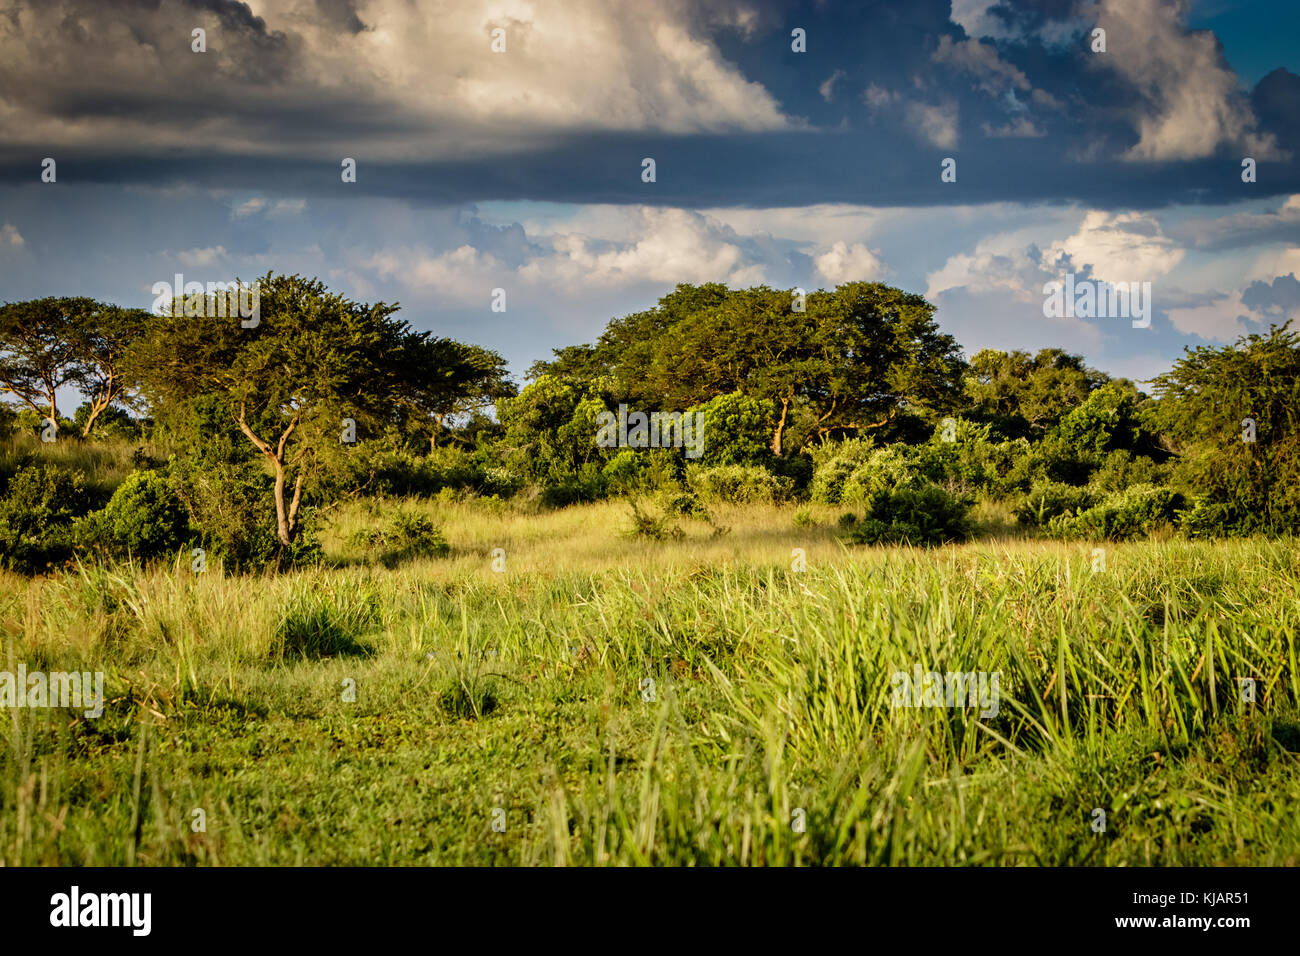 Grassland Ecosystem Pictures